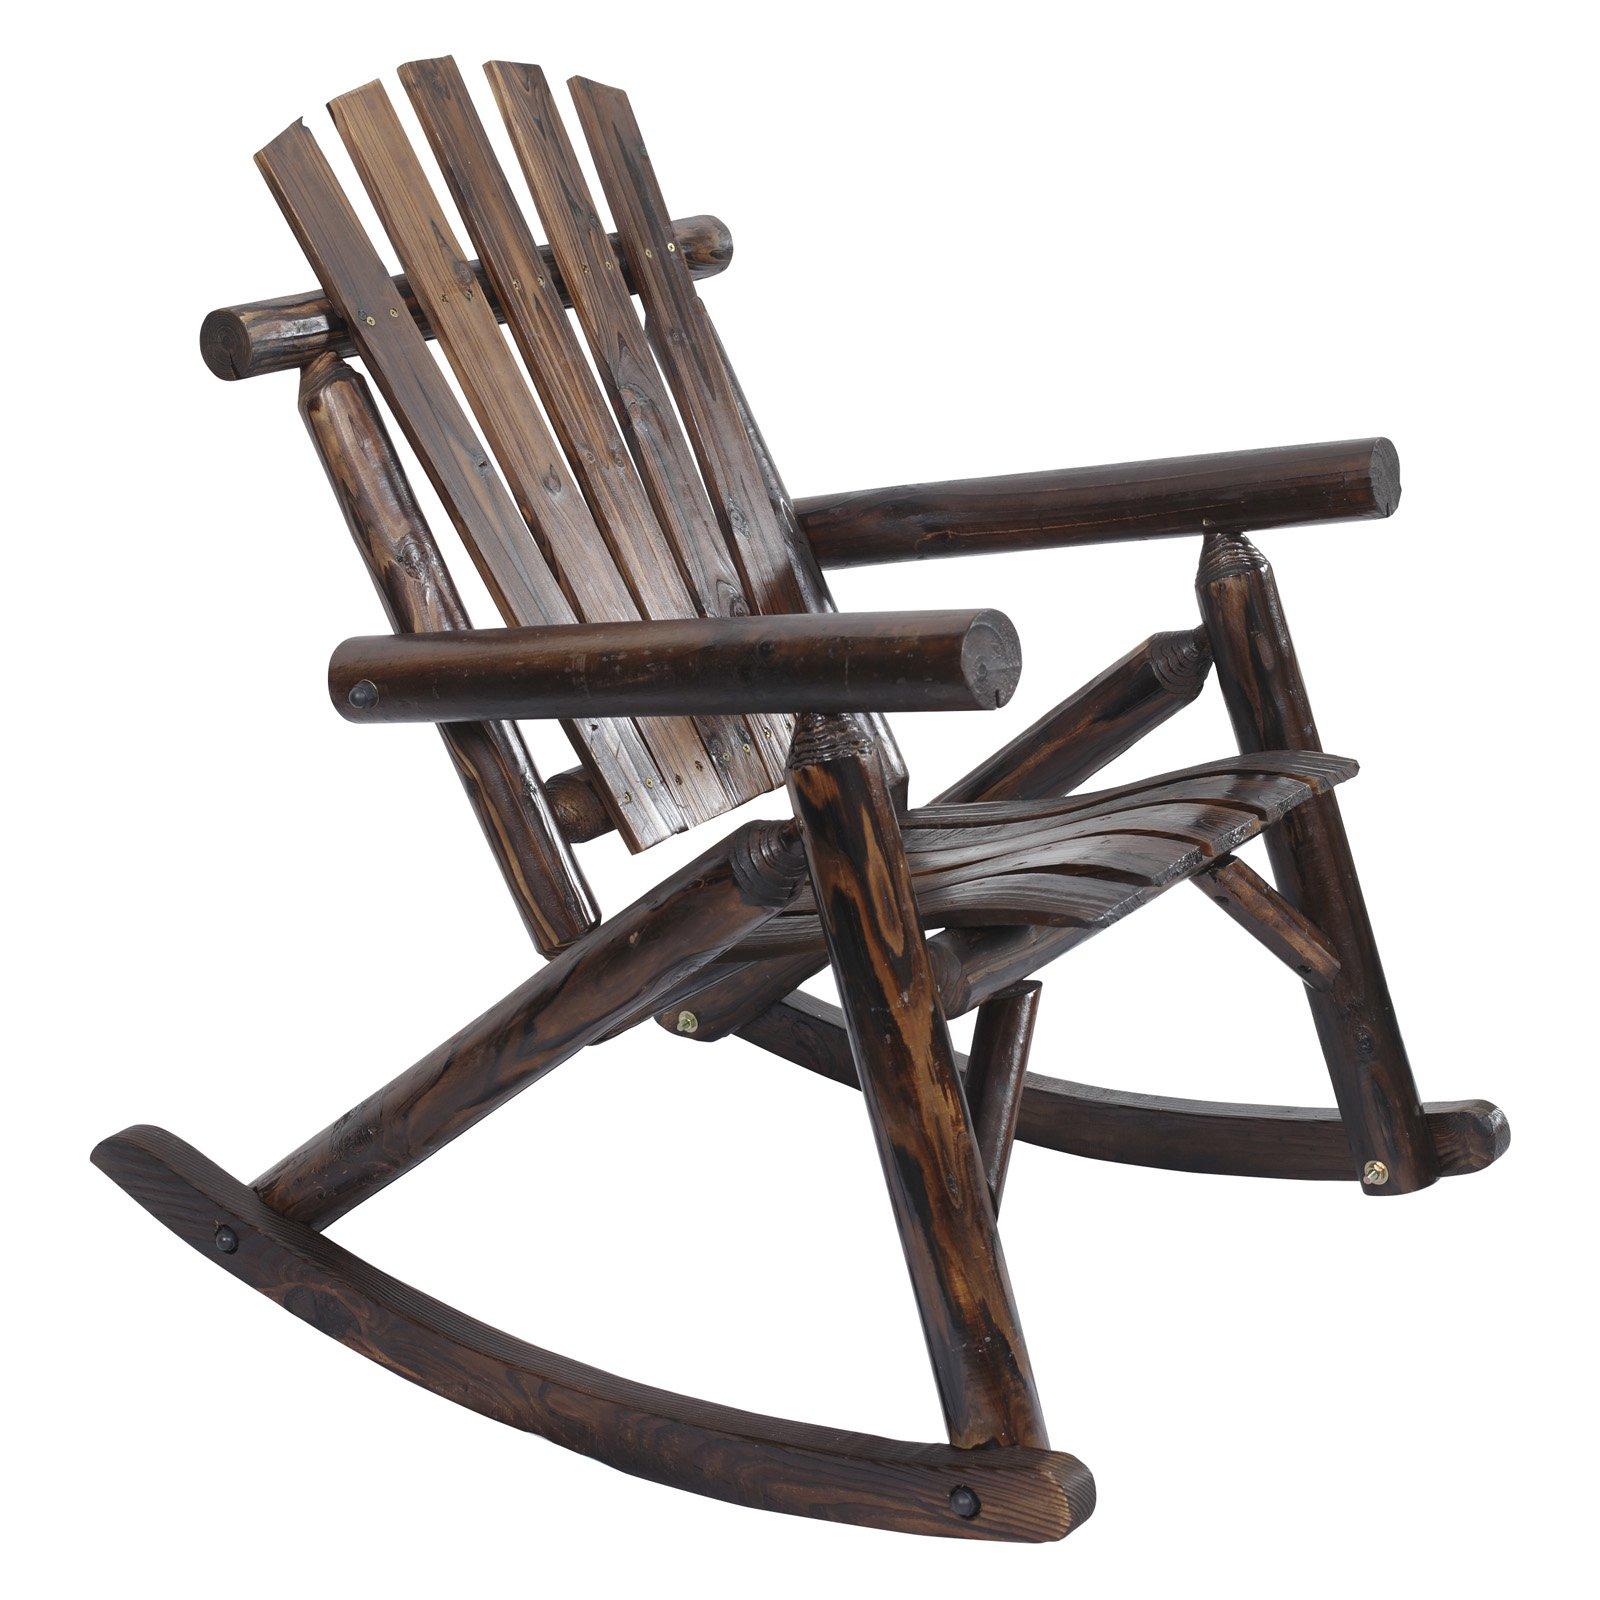 Great American Furniture Classics Log Rocking Chair, Burnt Finish   Walmart.com